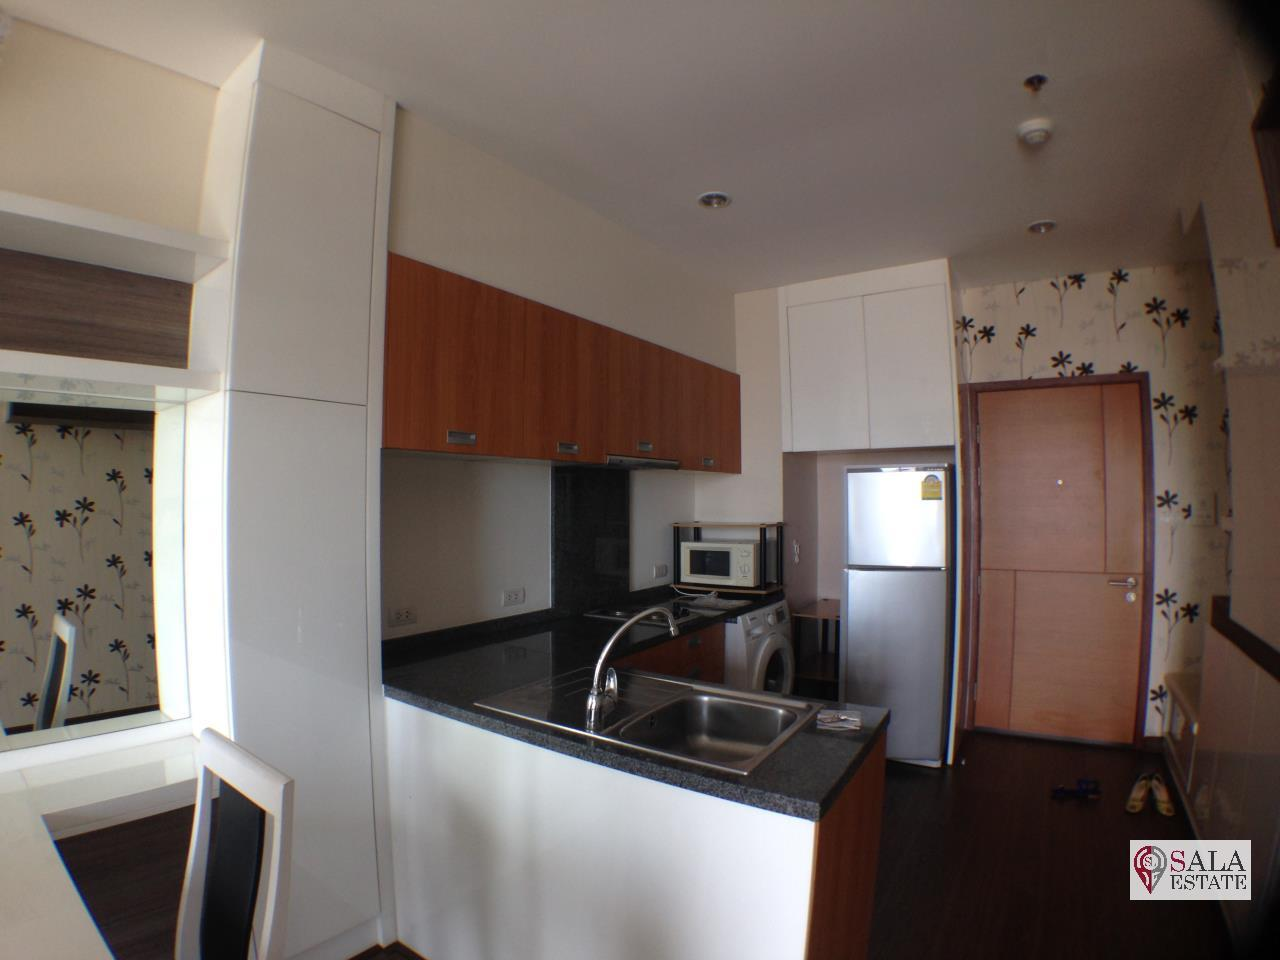 SALA ESTATE Agency's VILLA SATHORN – BTS KRUNG THONBURI, 1 Bedroom 1 Bathroom, Fully furnished, City View 4